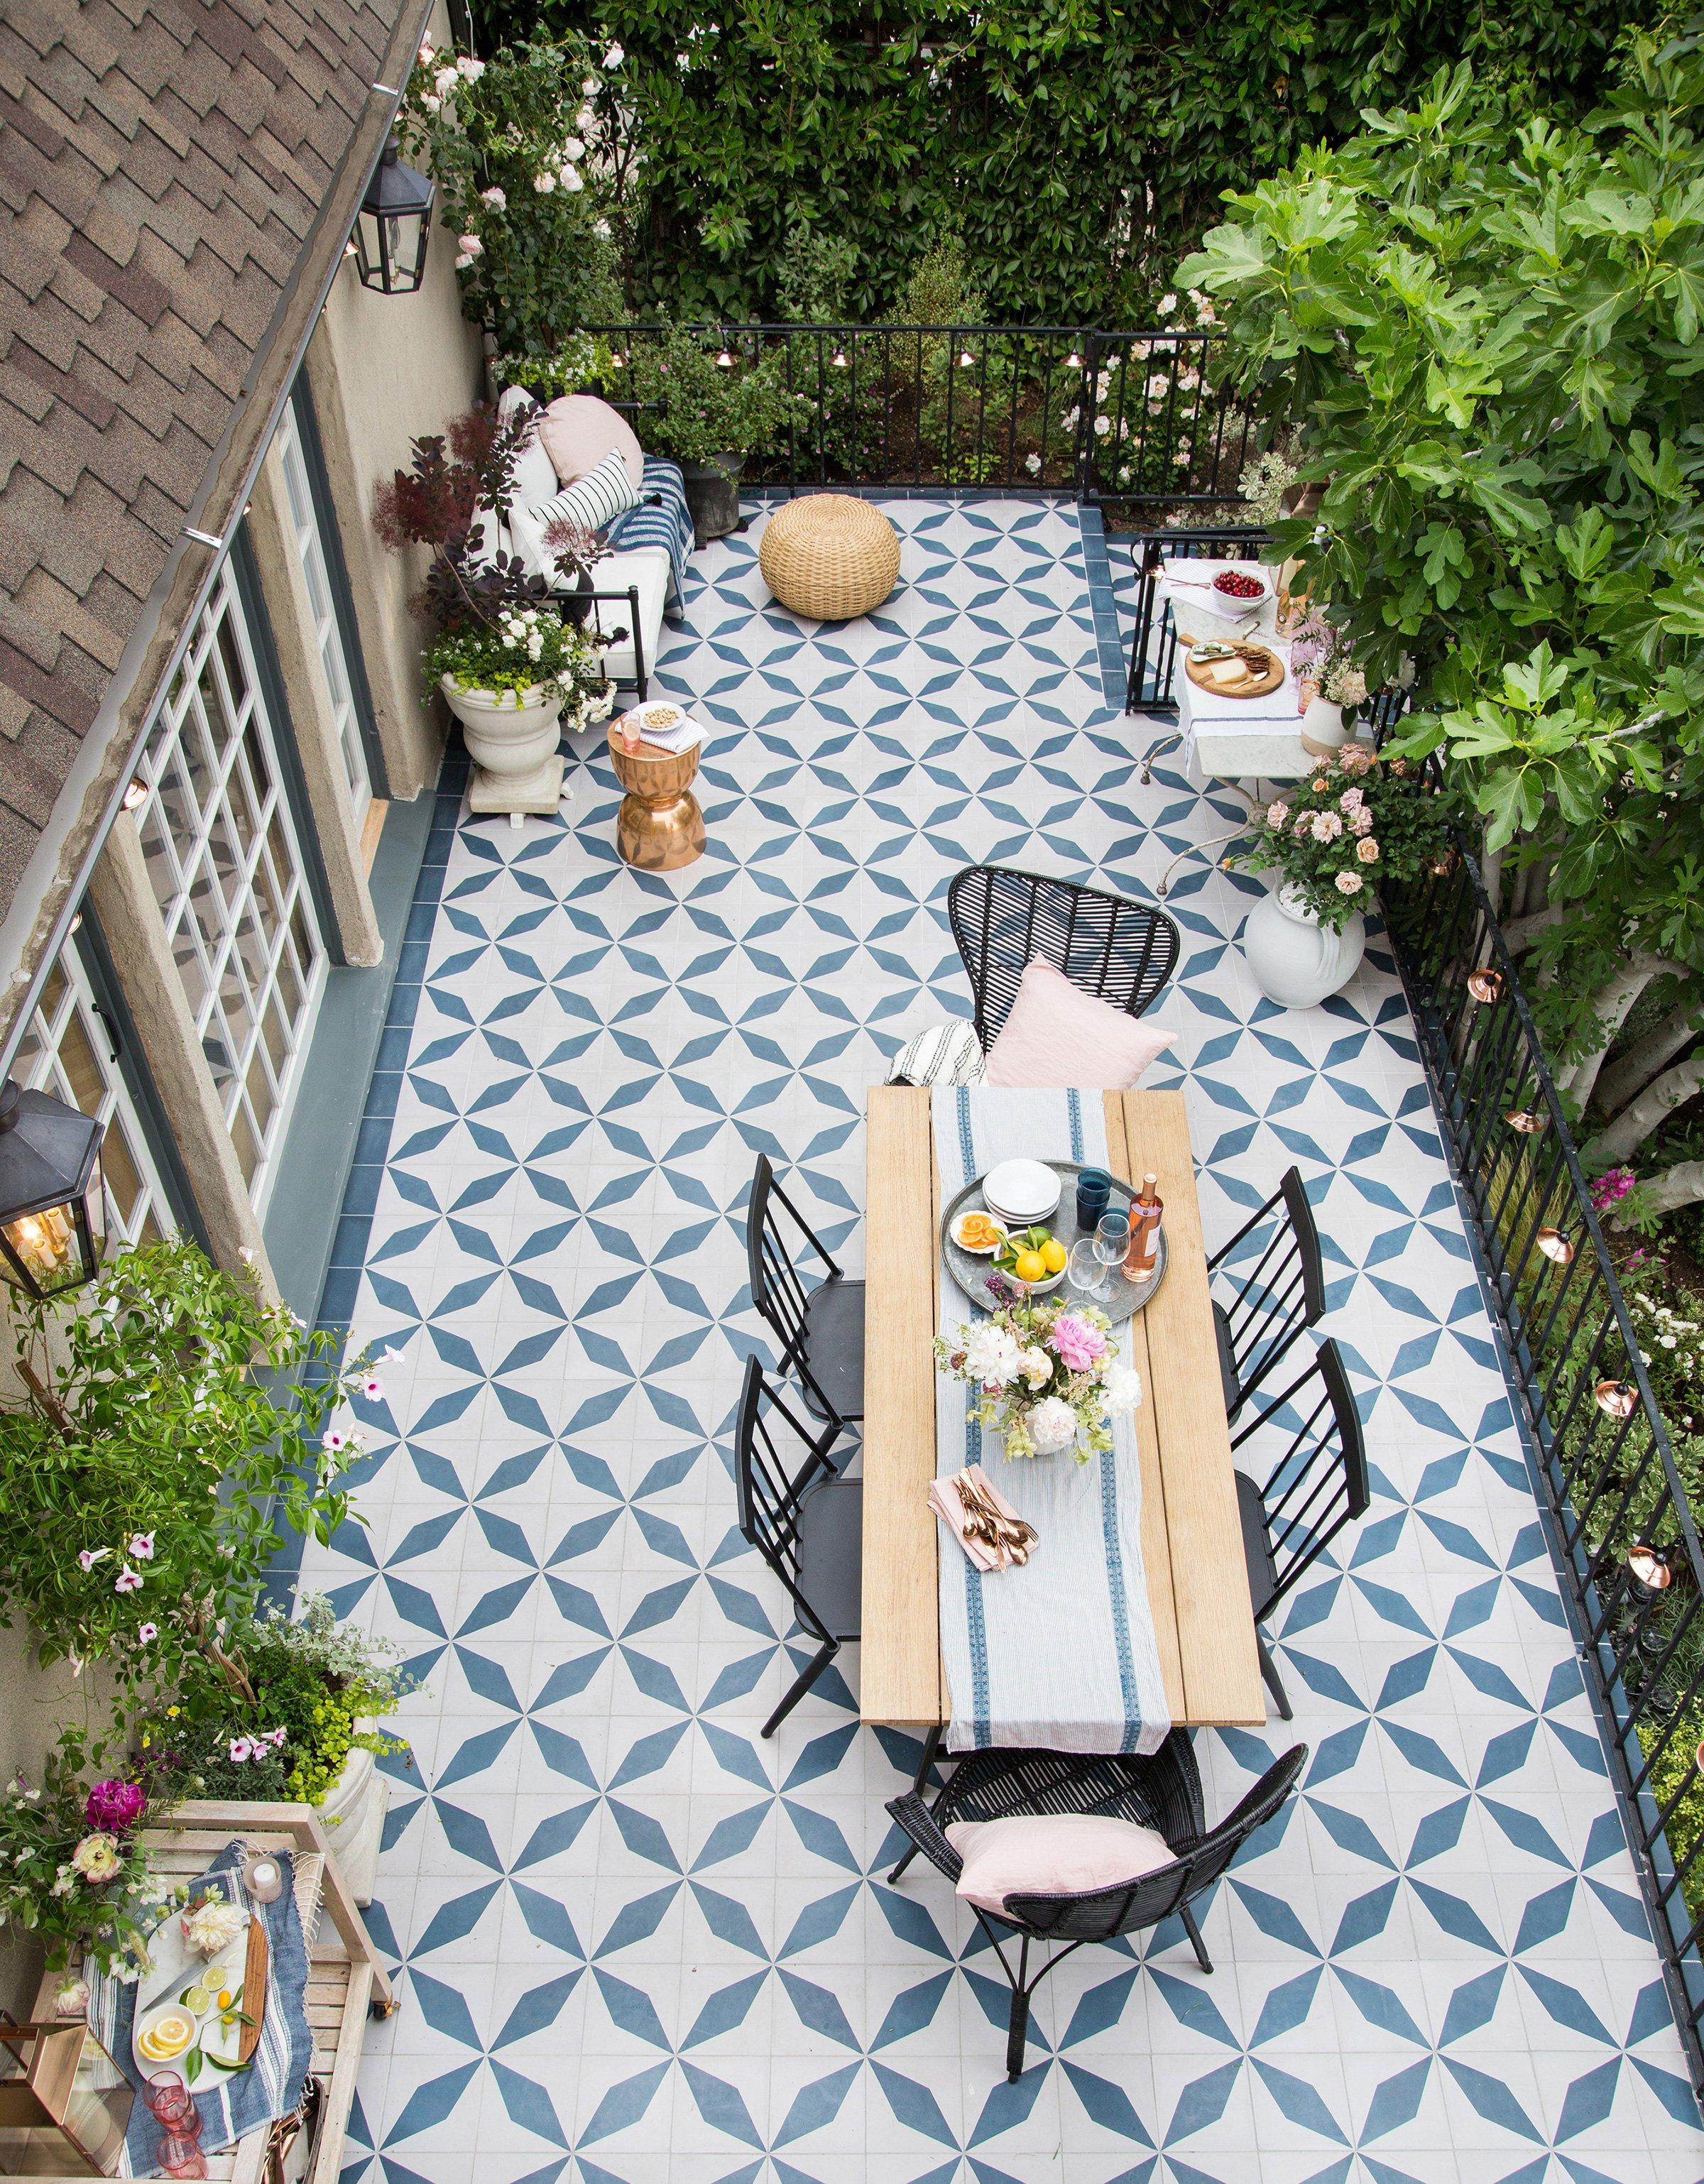 emily henderson outdoor tile granada tile echo collection buniel pattern midnight hawk patio